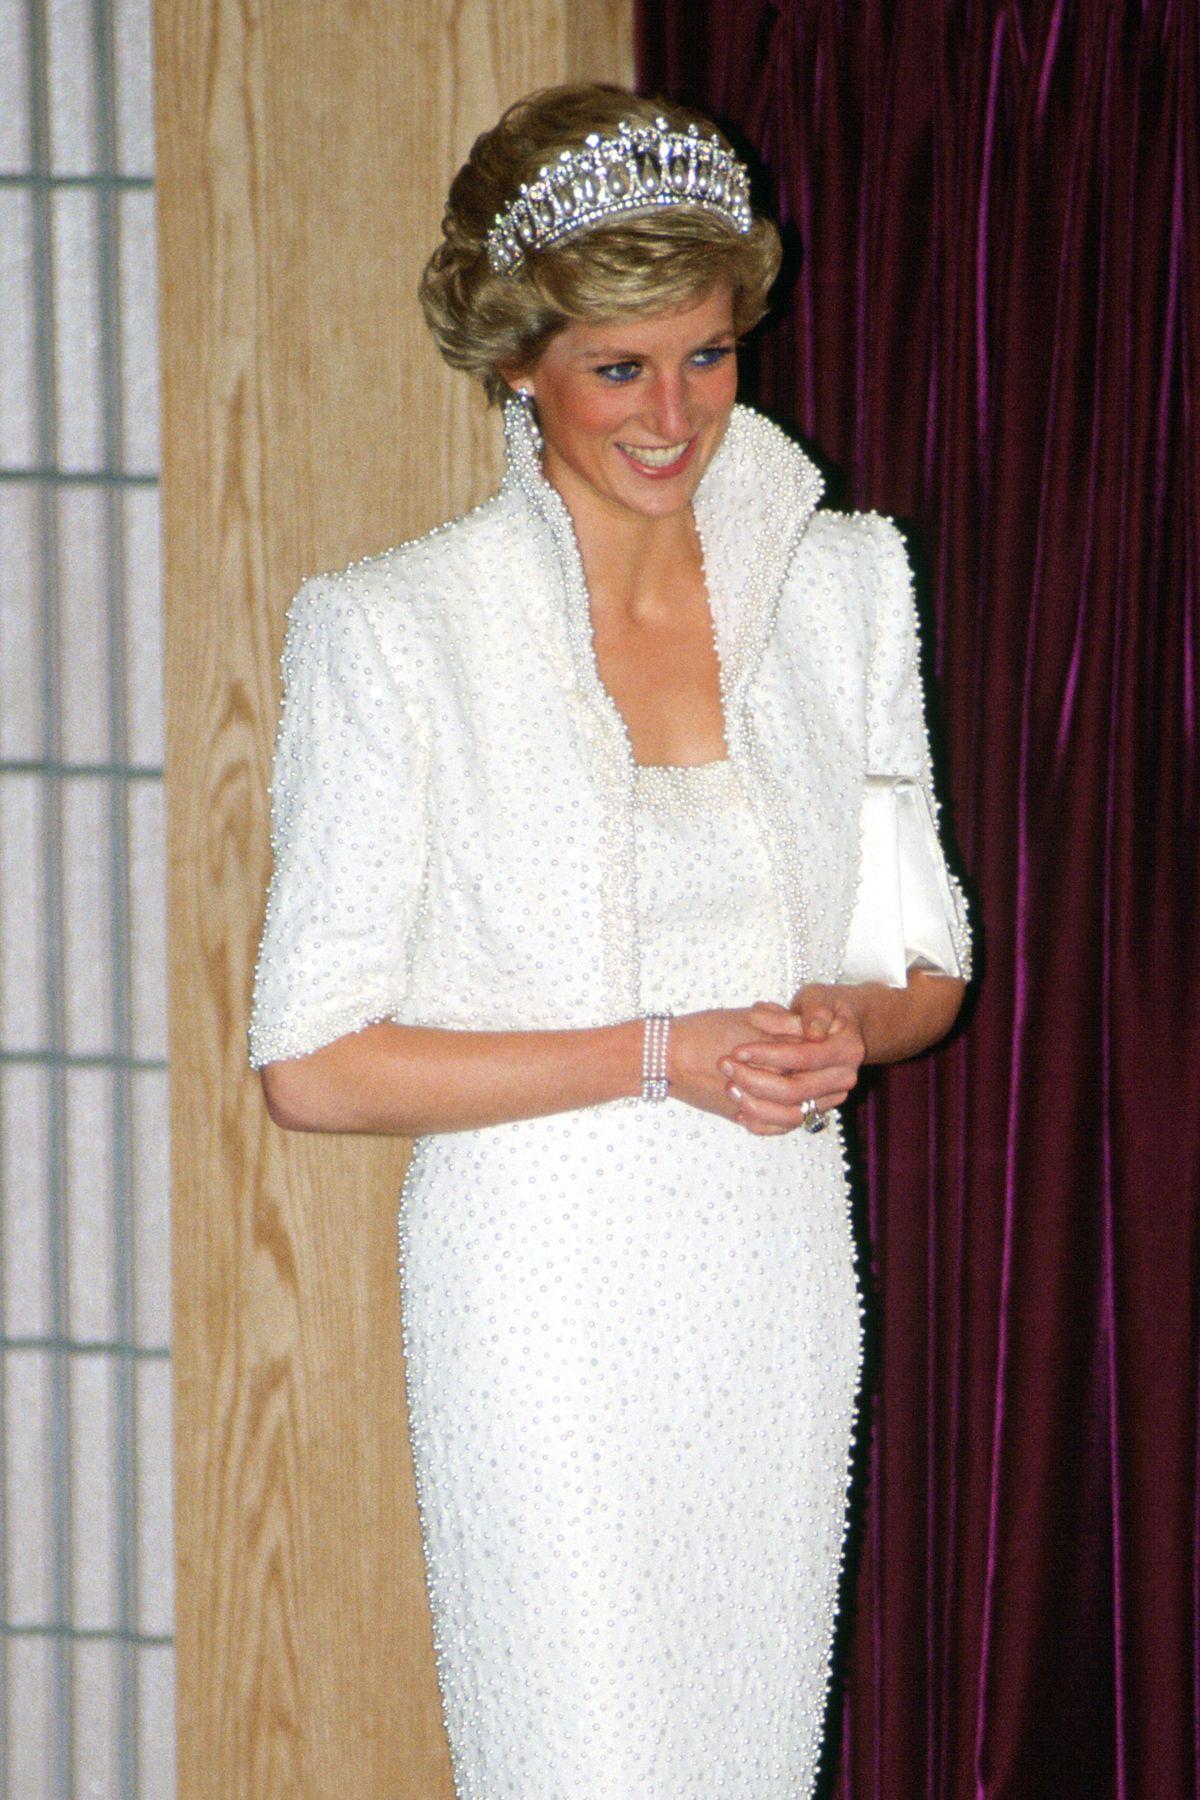 A timeline of Princess Diana's life